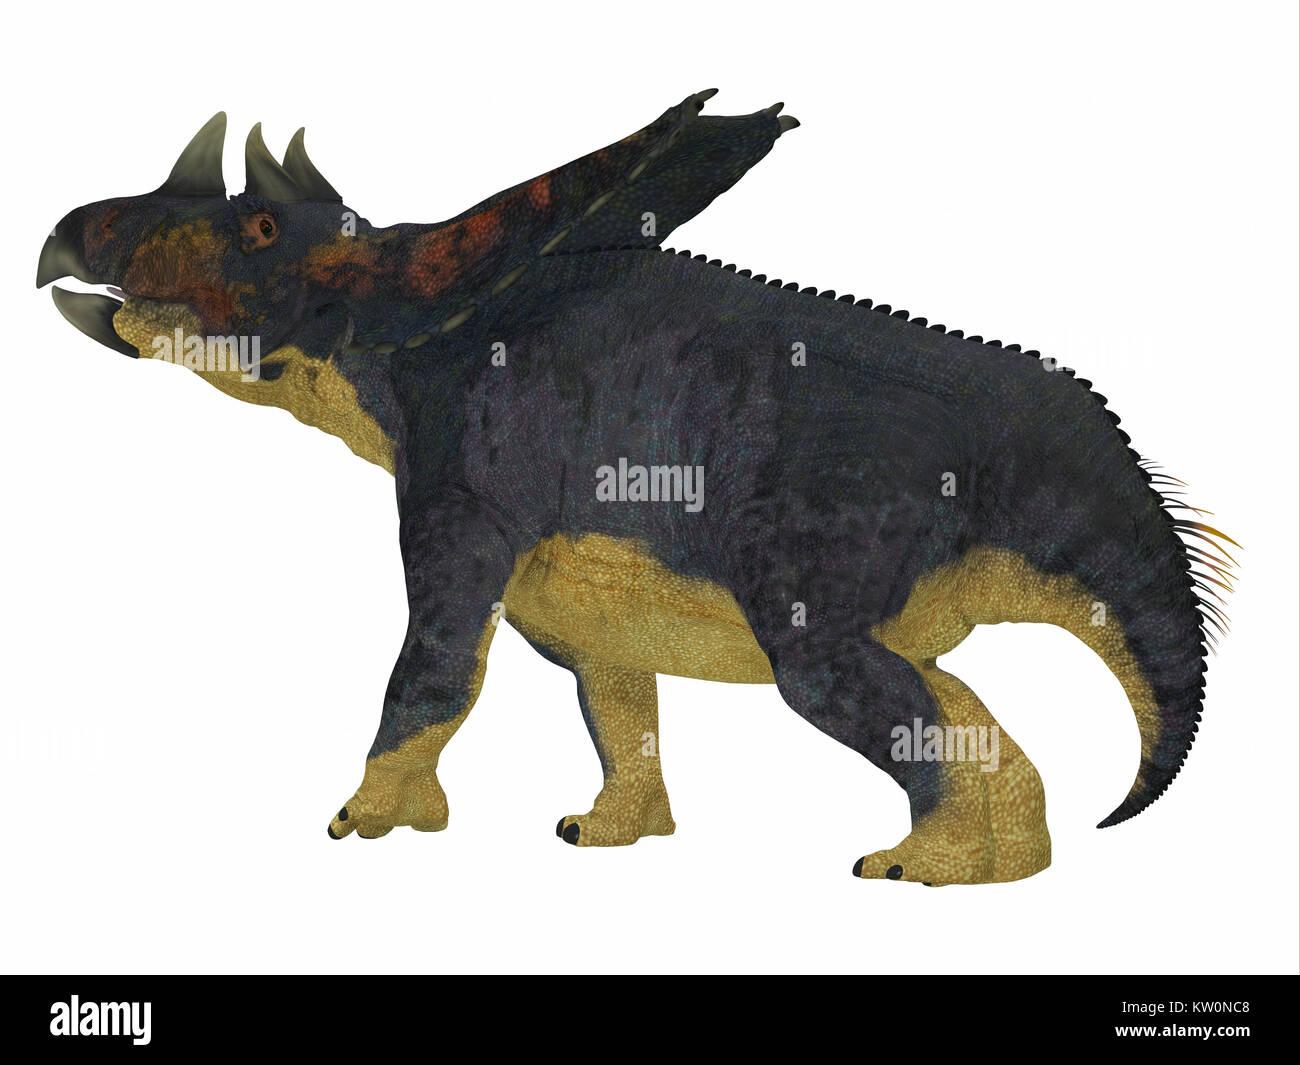 Chasmosaurus Dinosaur Tail - Chasmosaurus was a herbivorous ceratopsian dinosaur that lived in Alberta, Canada during - Stock Image